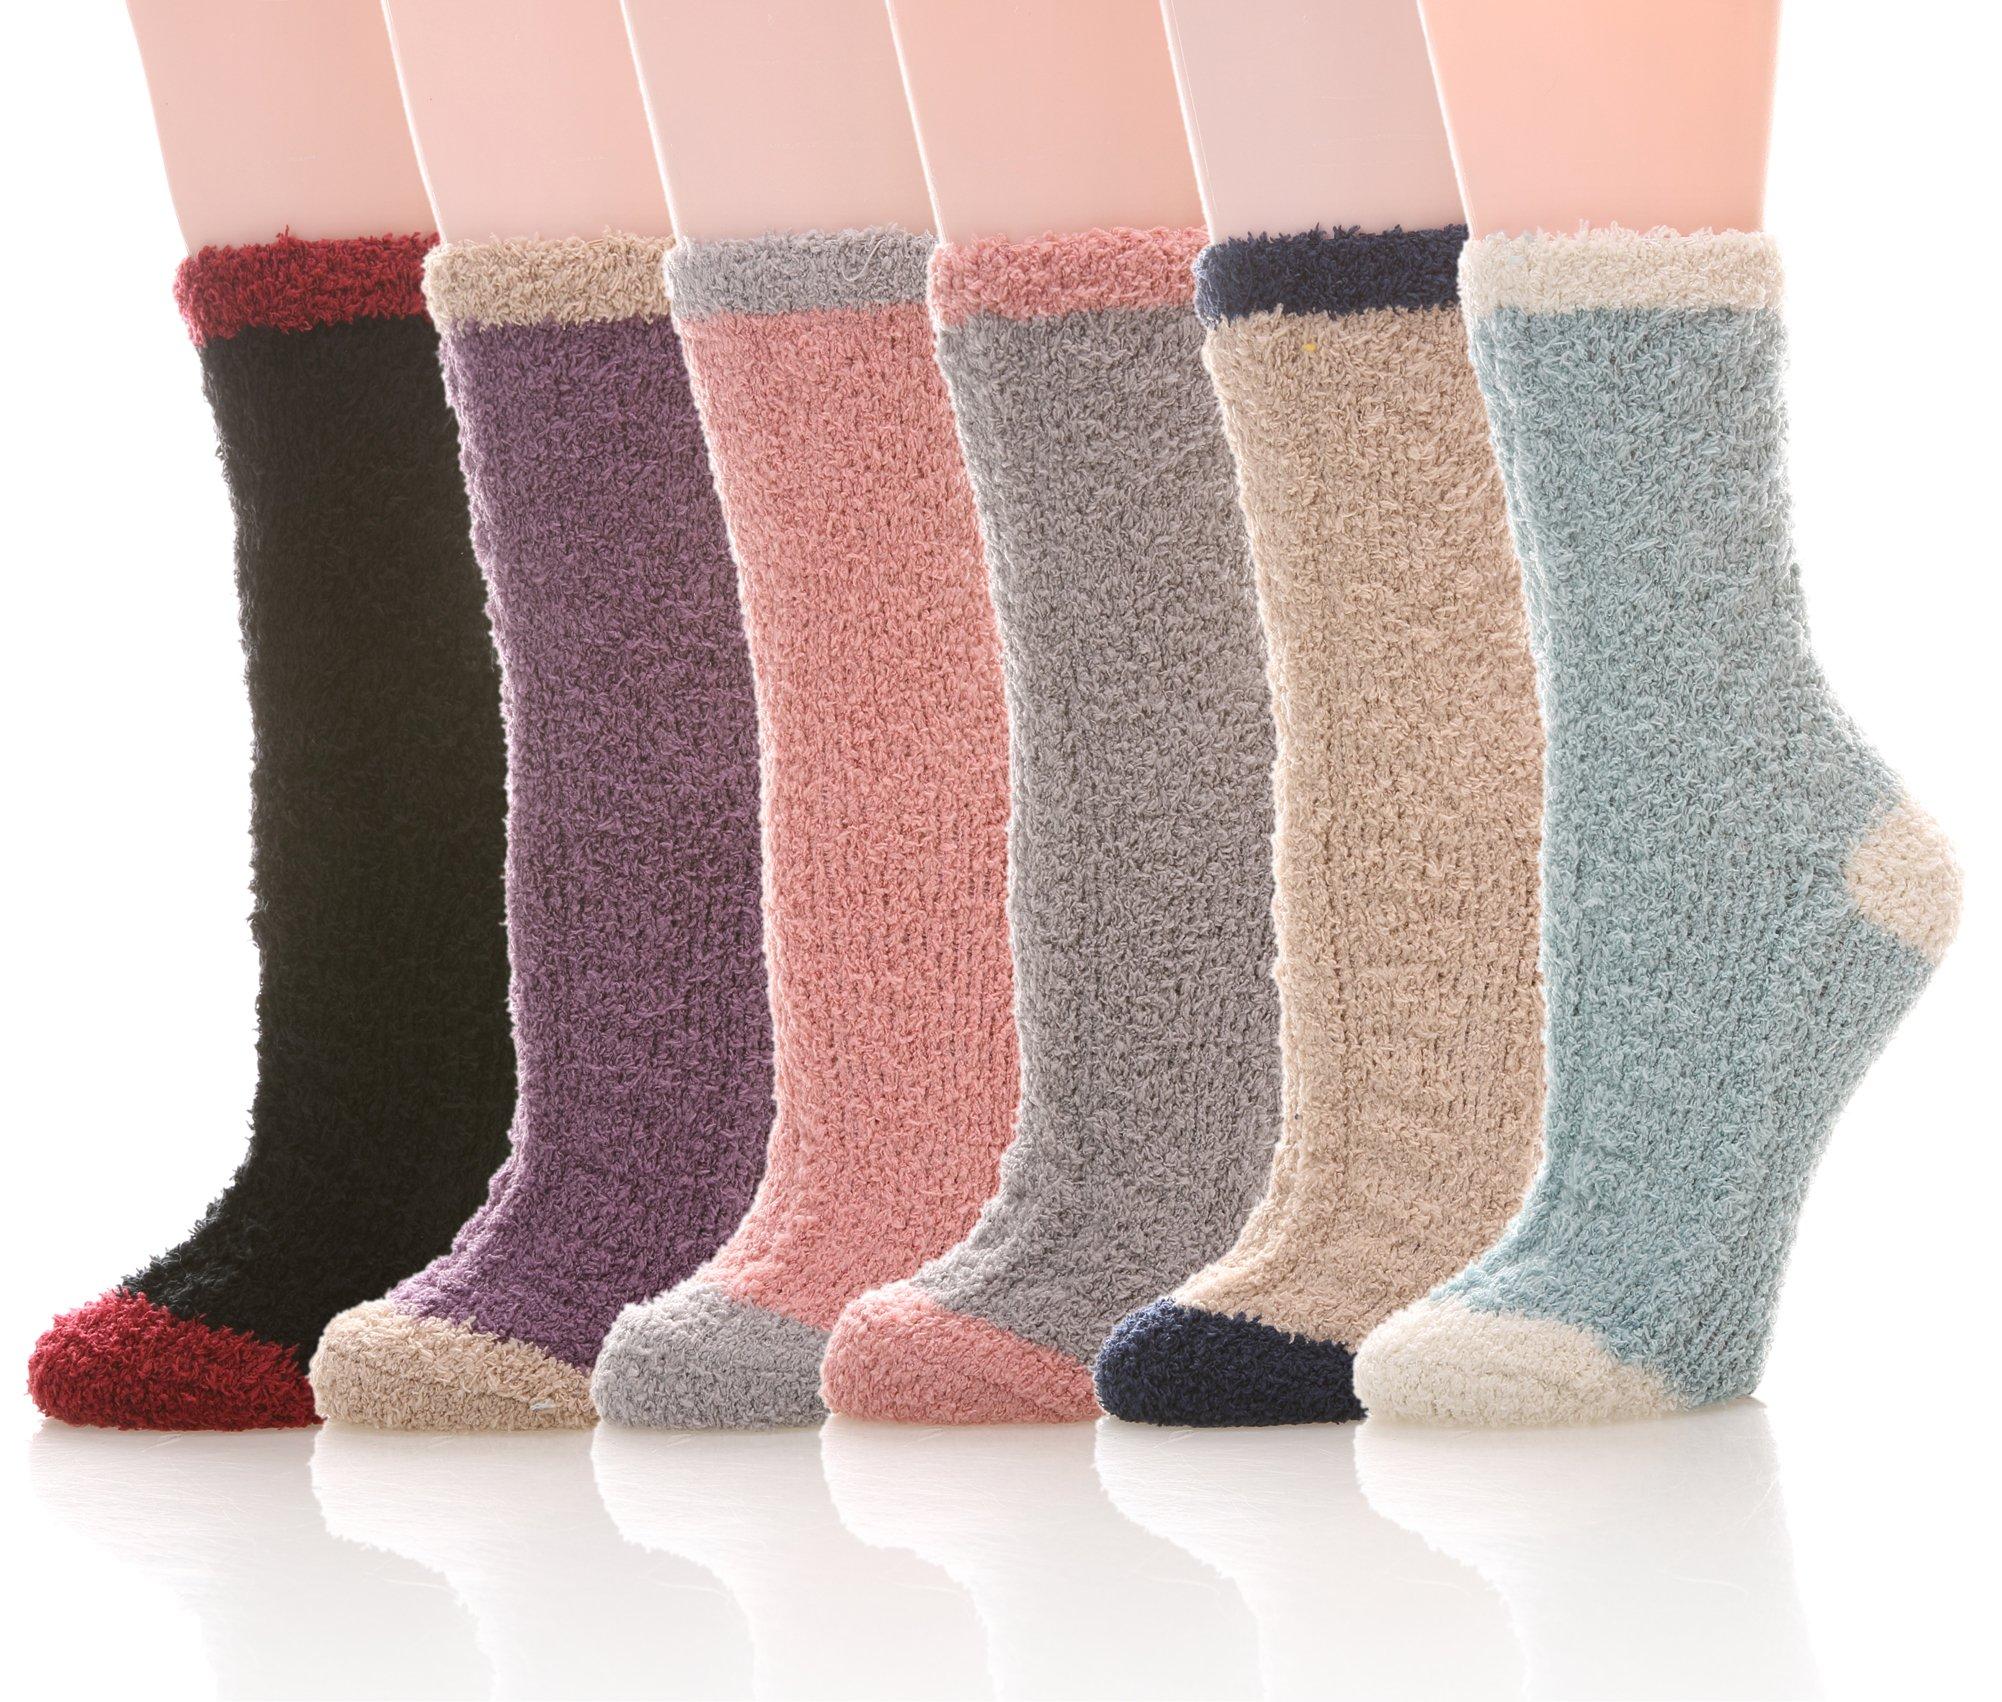 YEBING 6 Pairs Women's Cozy Slipper Socks Super Soft Fuzzy Winter Warm Socks Multi Color (Mixed Color)